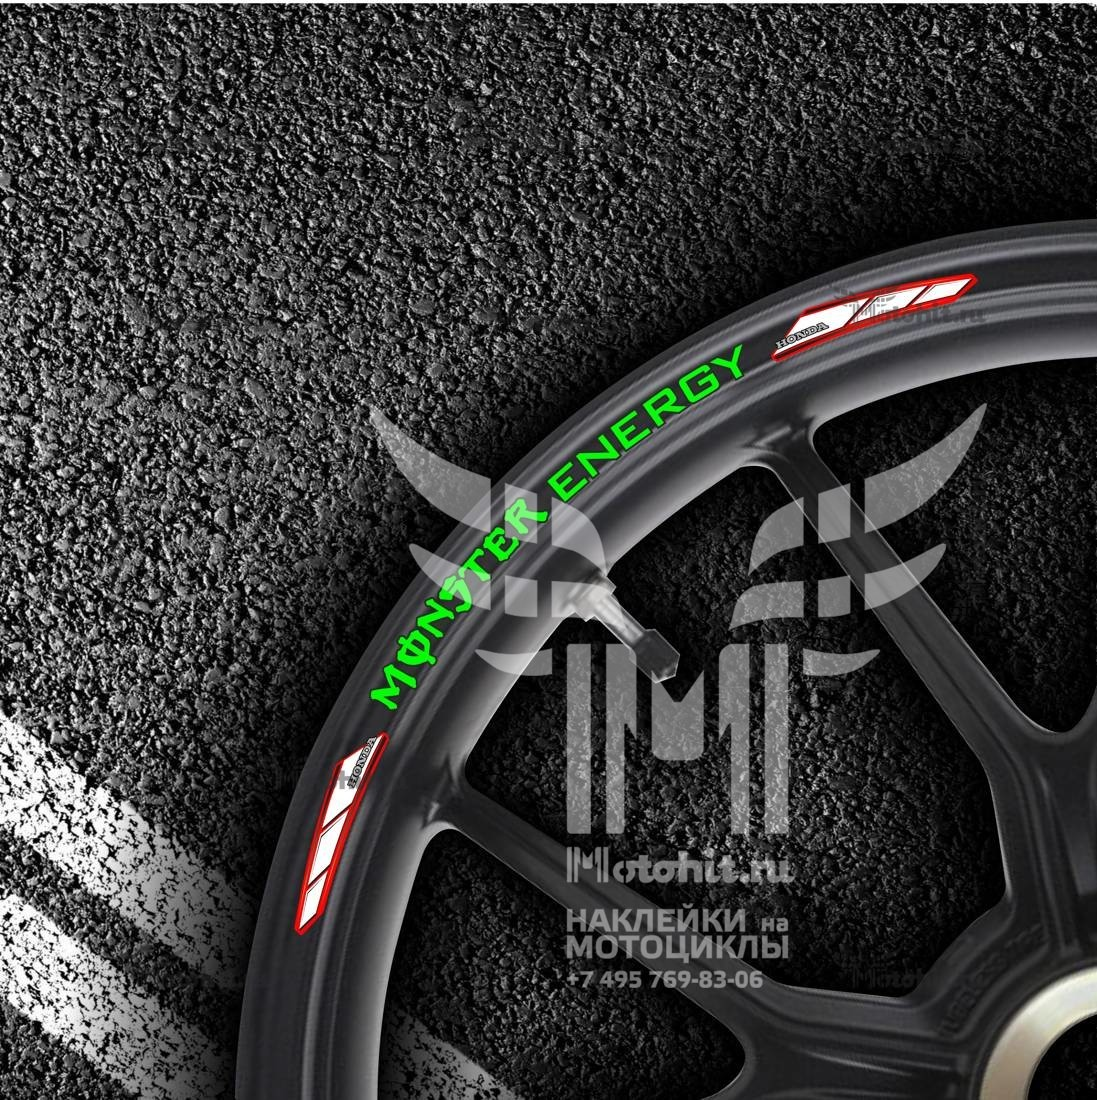 Комплект наклеек на обод колеса мотоцикла HONDA MONSTER-ENERGY